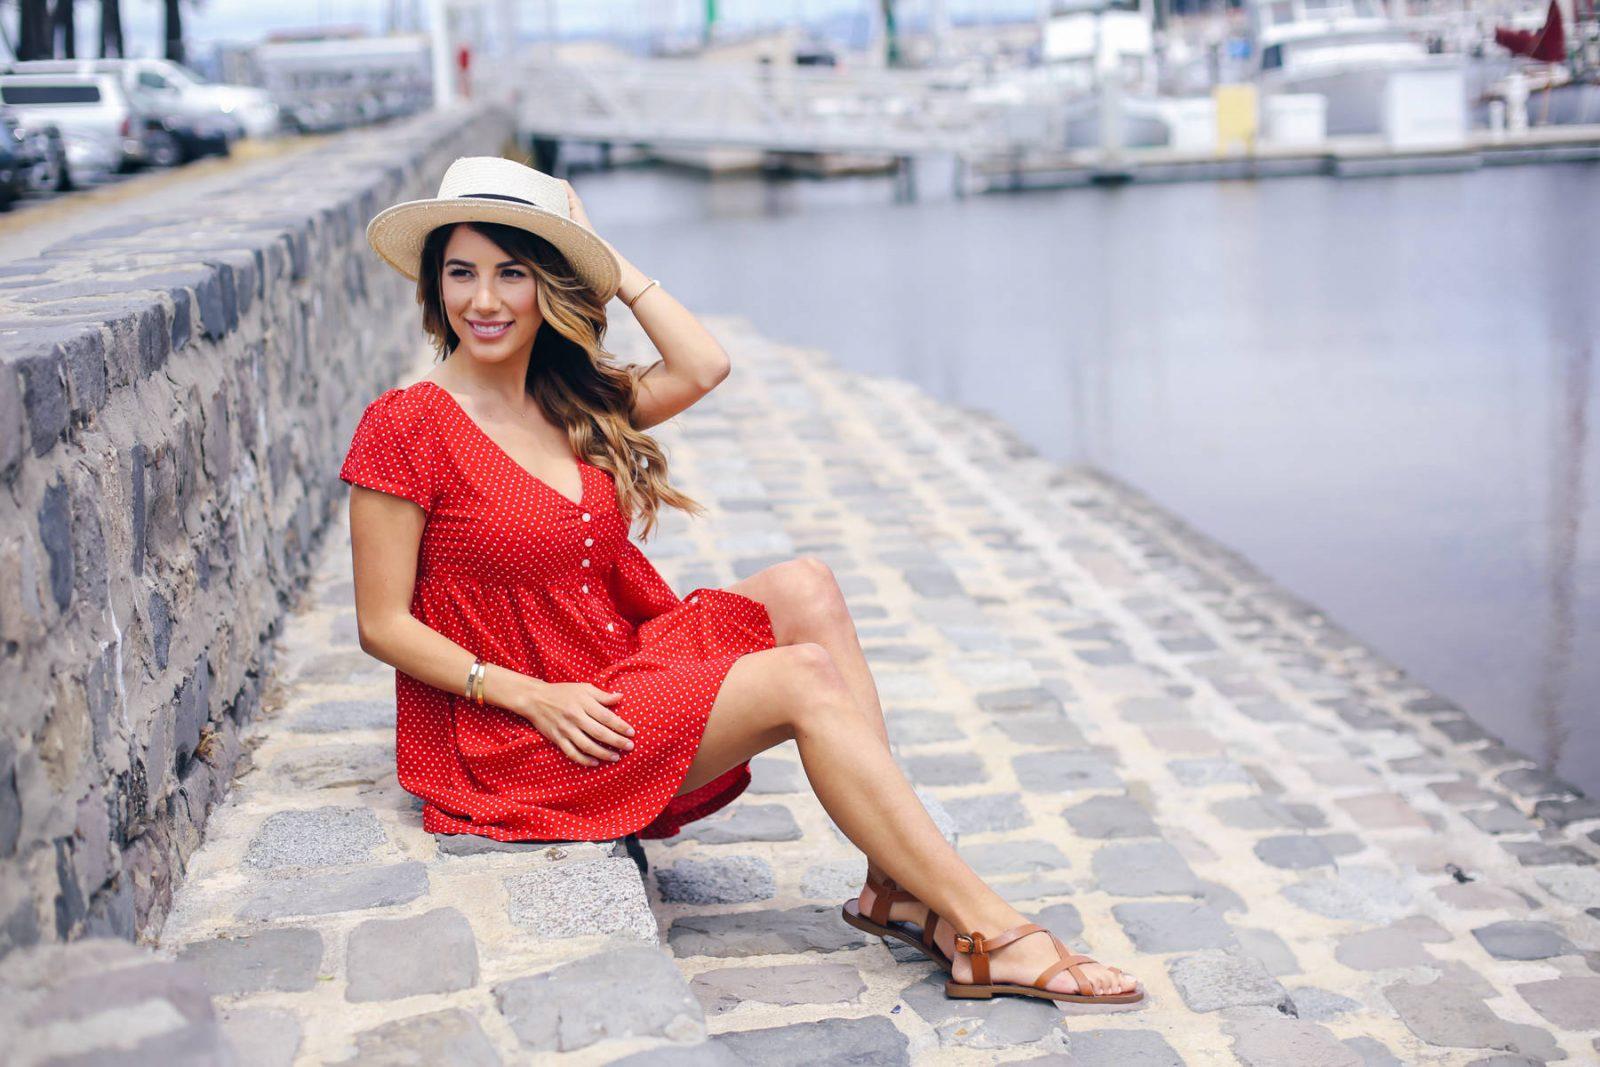 denim-jacket-red-dress-memorial-day-ariana-lauren-fashionborn-san-francisco-ryanbyryanchua-8710